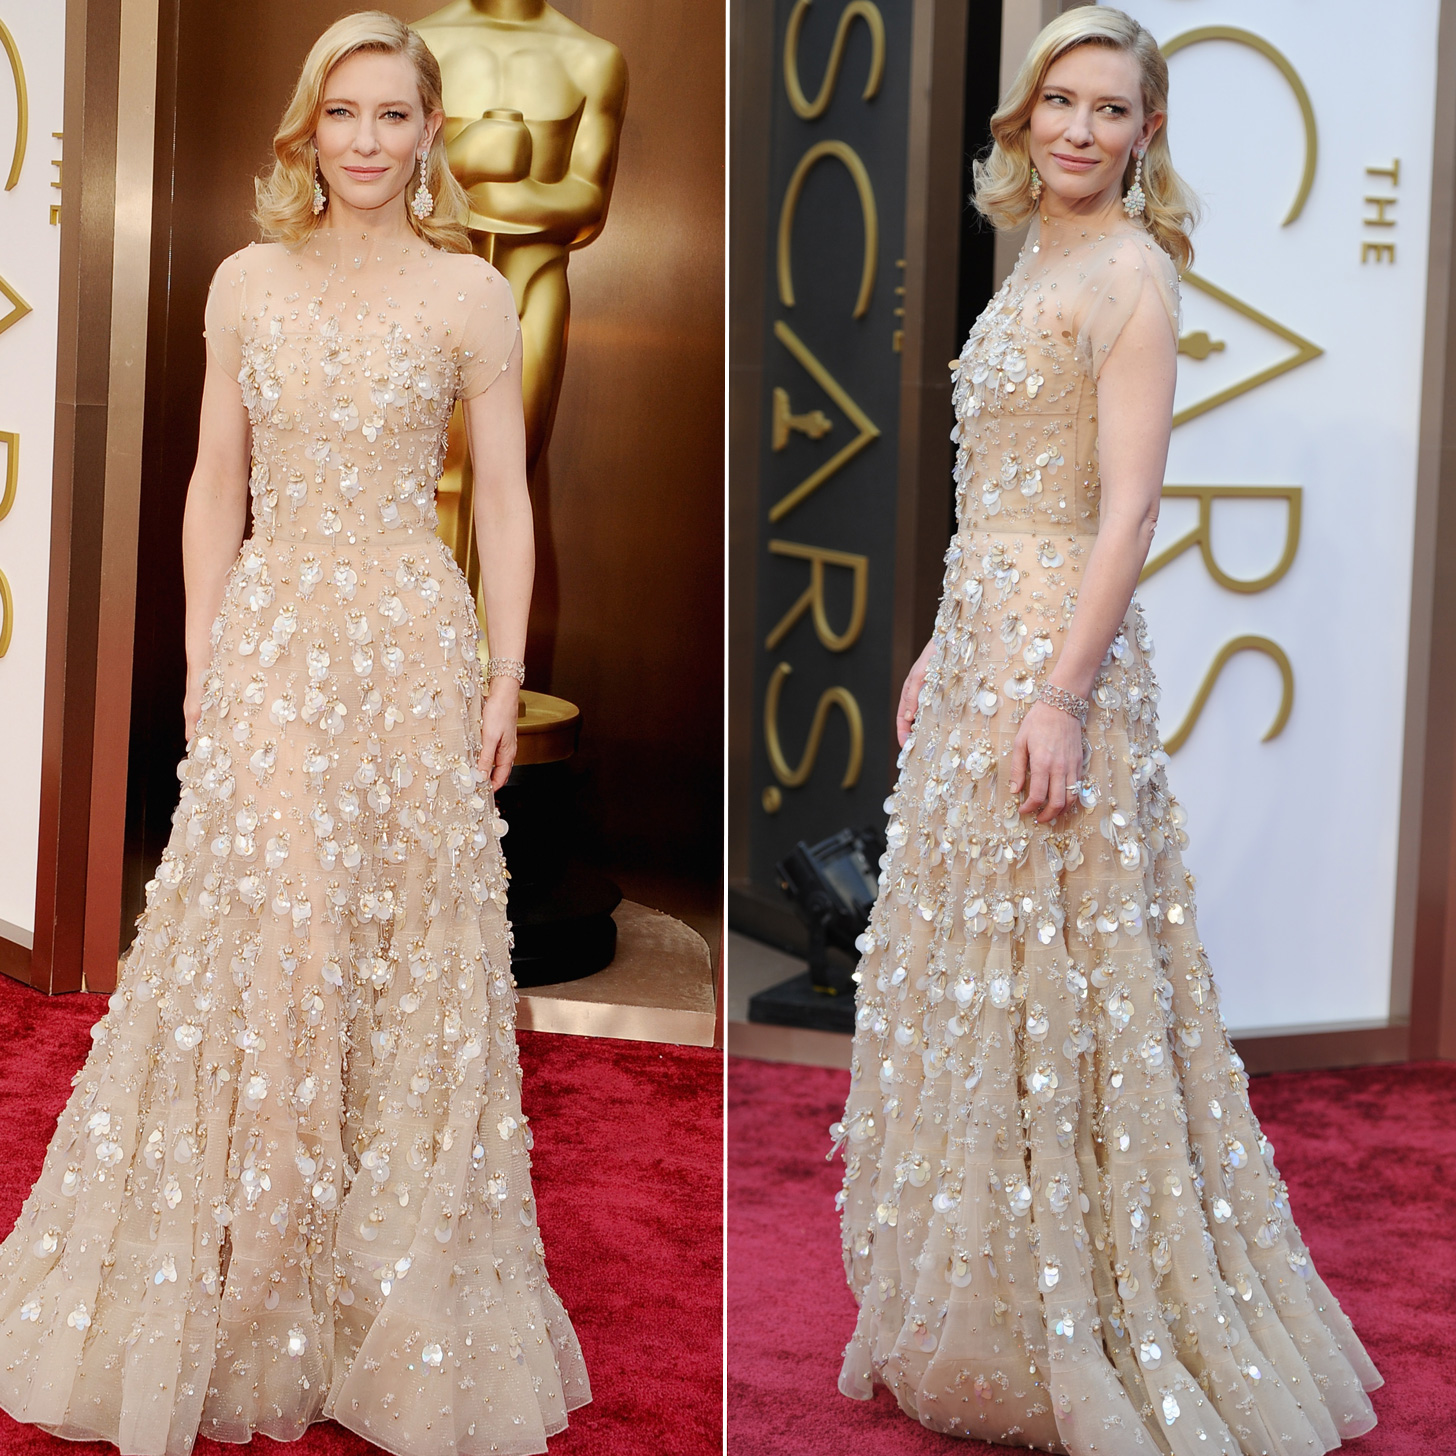 Cate Blanchett Armani Dress at Oscars 2014Cate Blanchett Oscars 2014